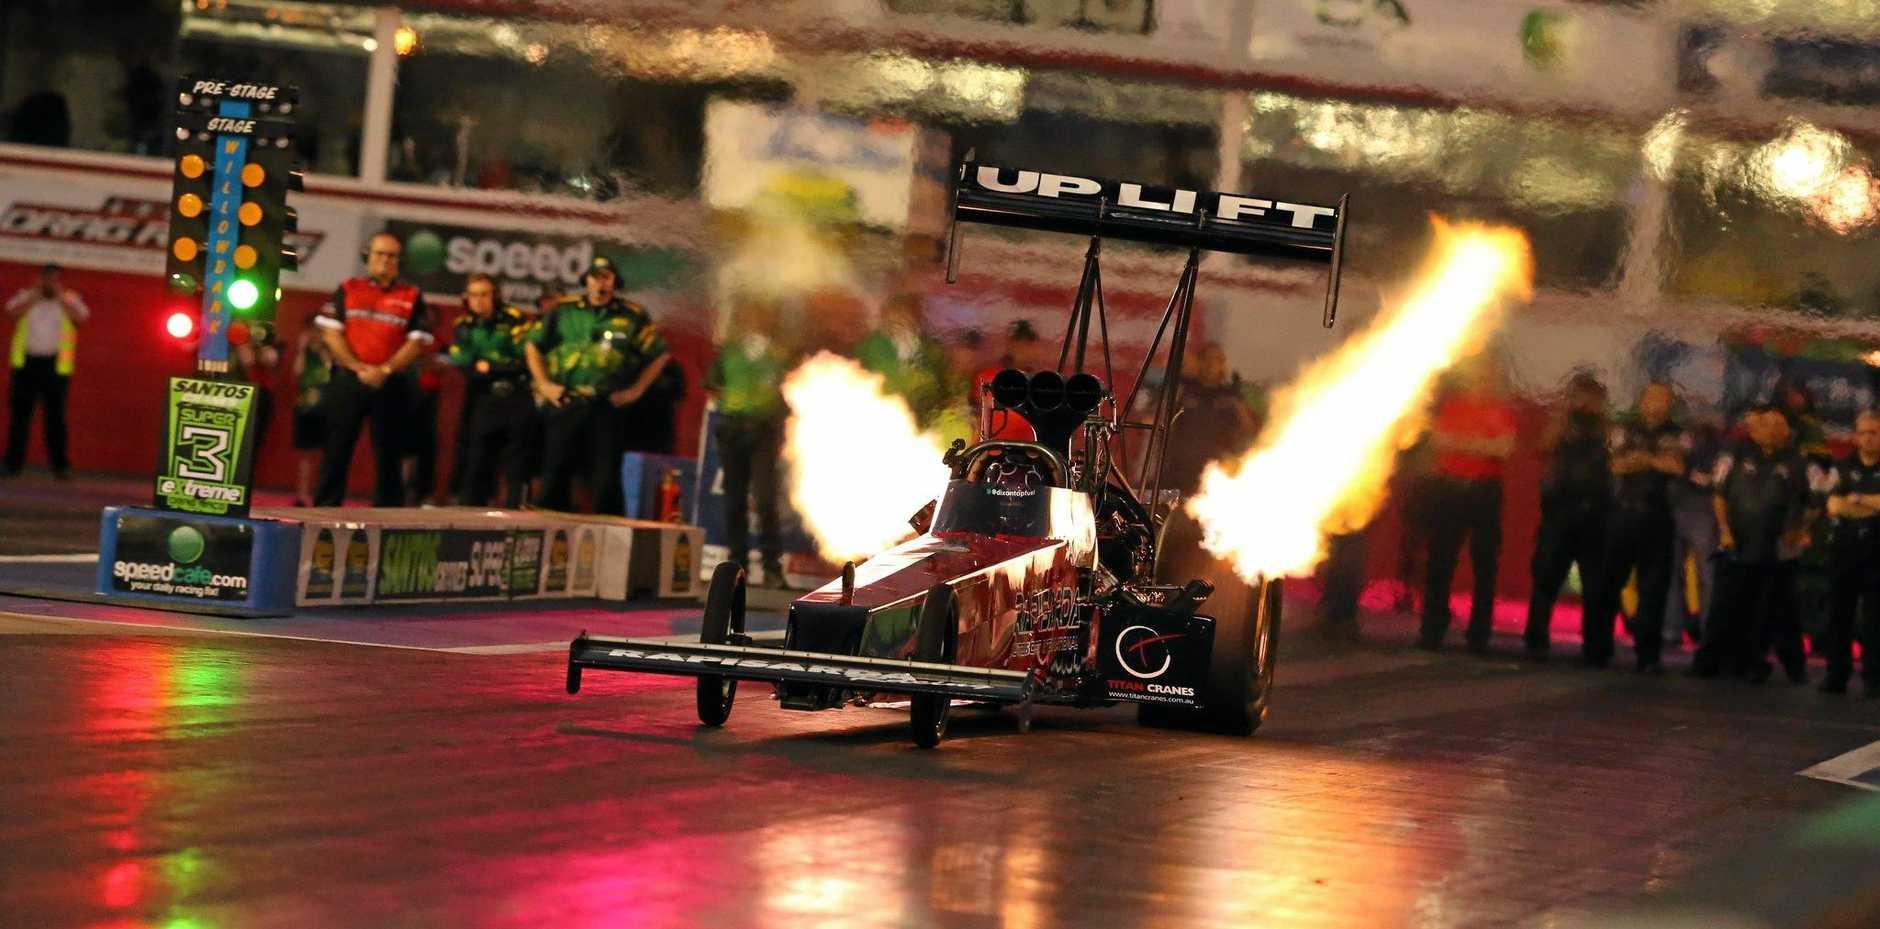 American Top Fuel drag racer Larry Dixon